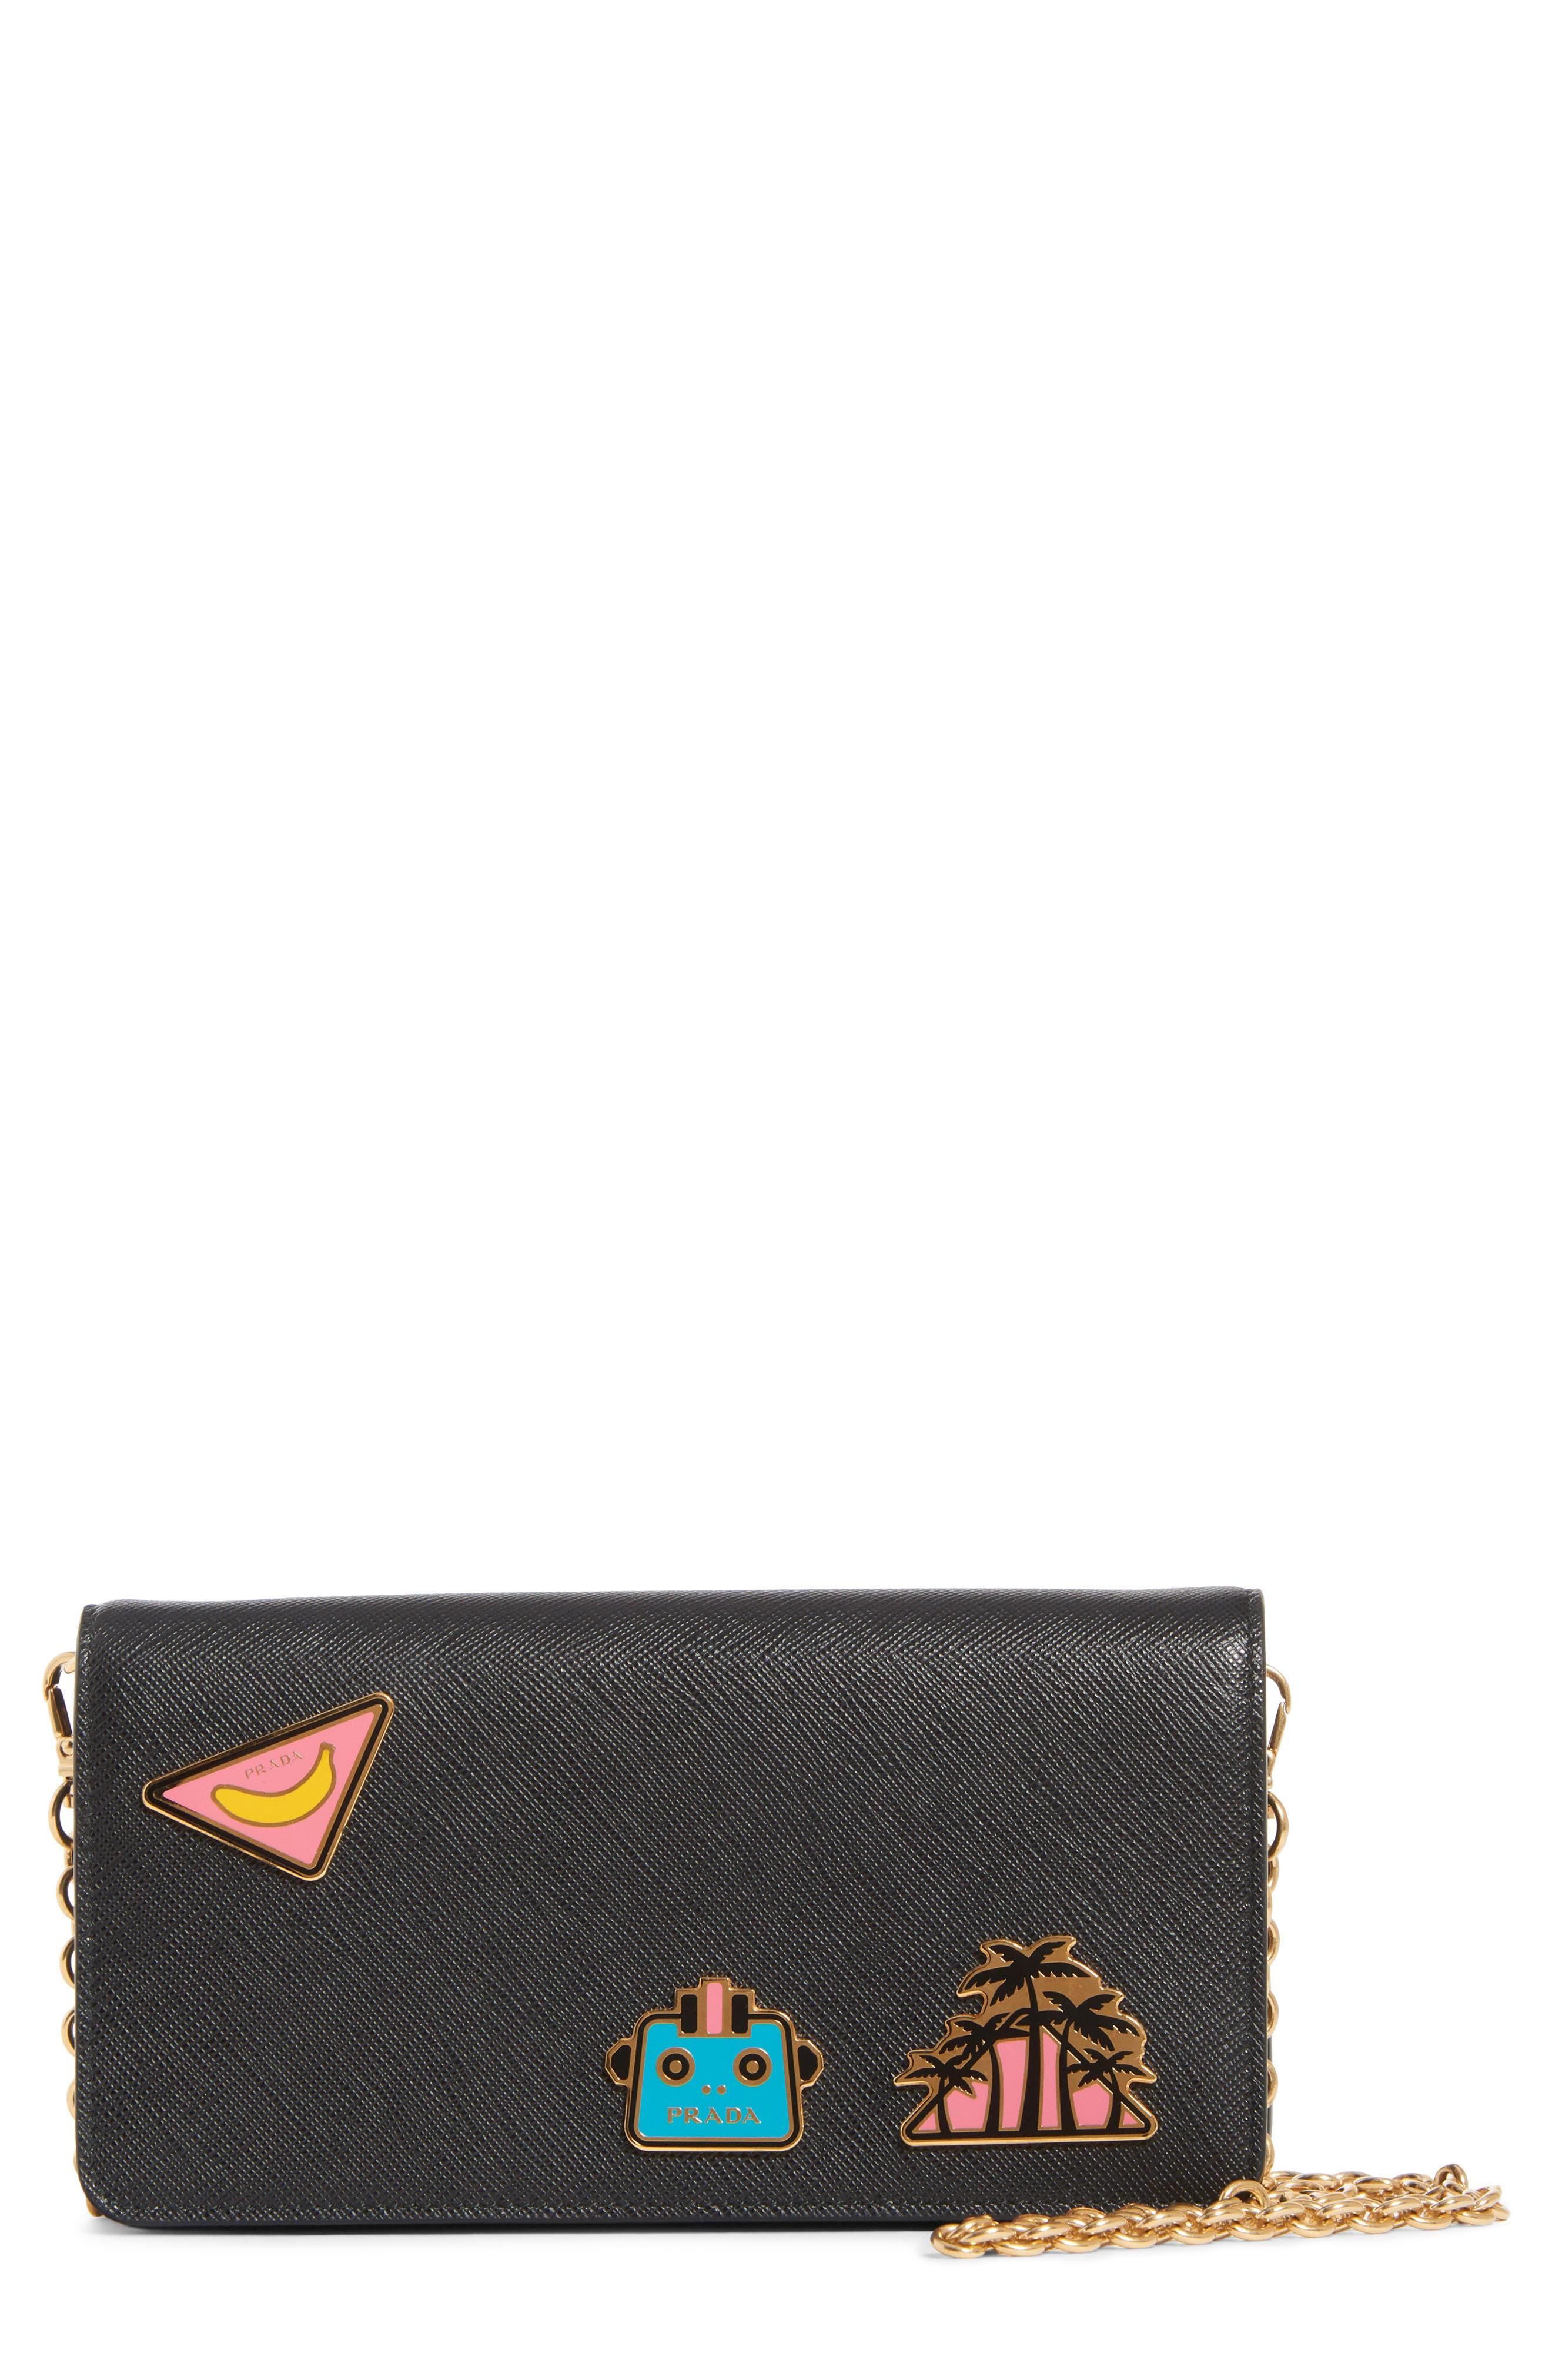 8c65e9b80042 Wallets Prada: Shoes, Accessories & Fragrance | Nordstrom